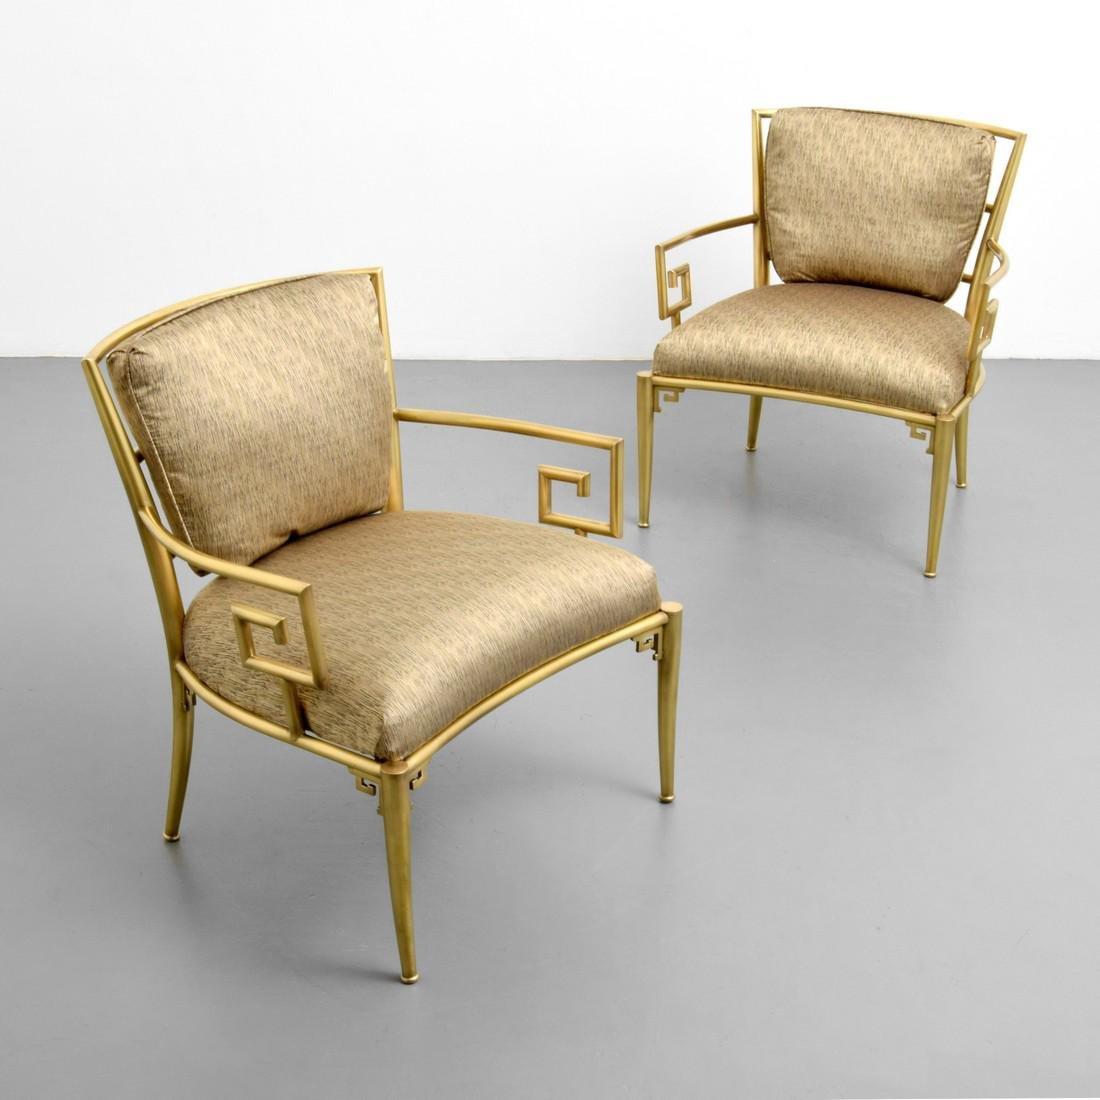 Greek Key Lounge Chairs, Attributed to Mastercraft - 8